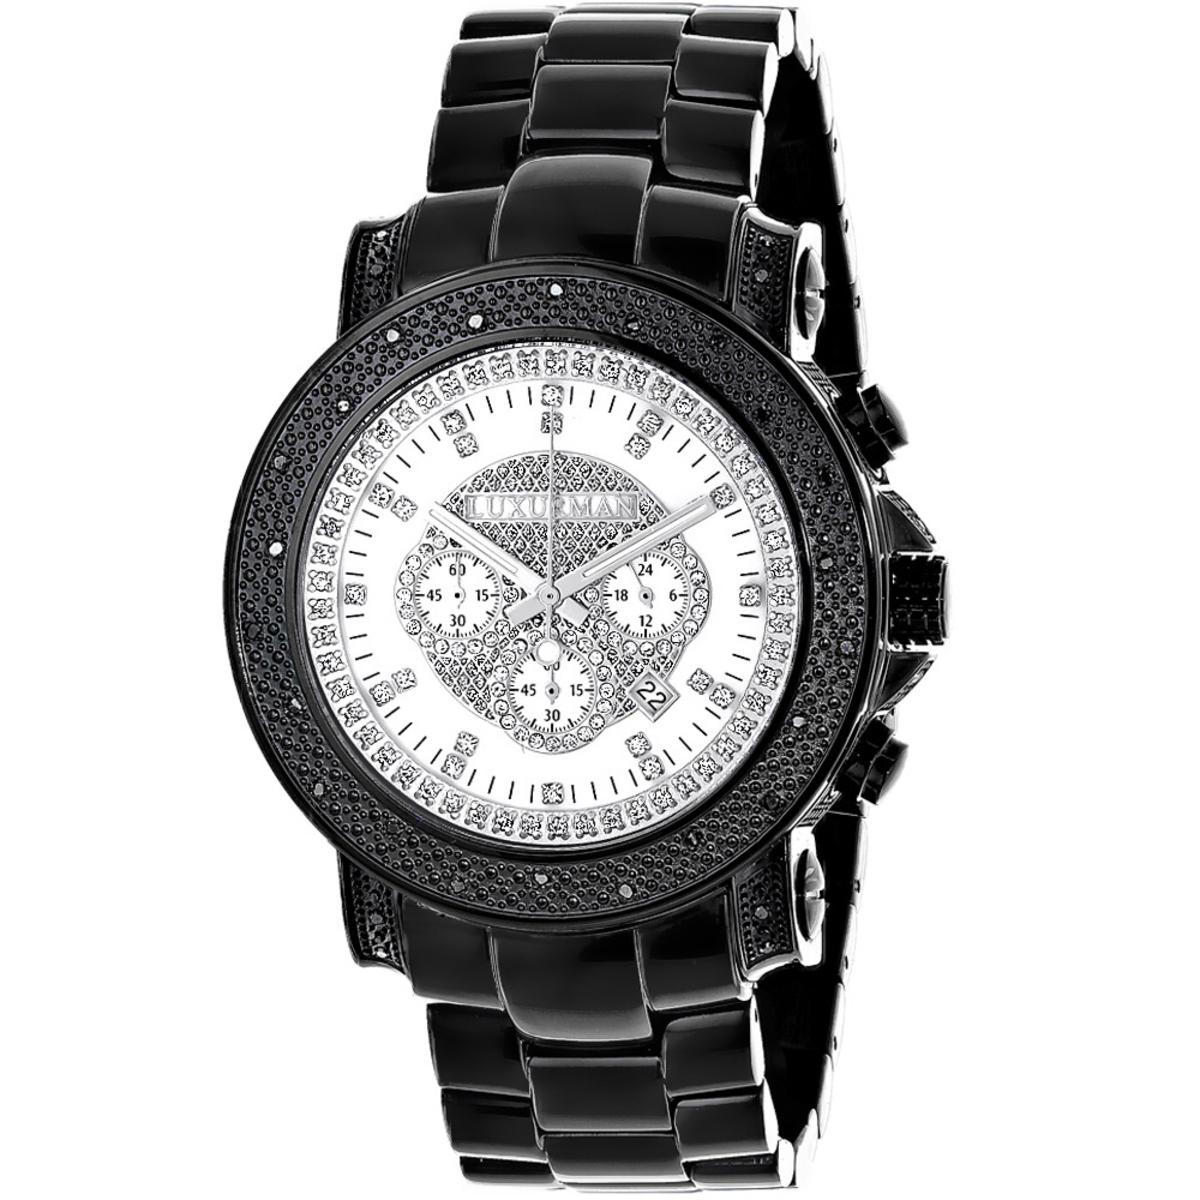 Hip Hop Watches: Oversized Luxurman Escalade Mens Black Diamond Watch 3/4ct